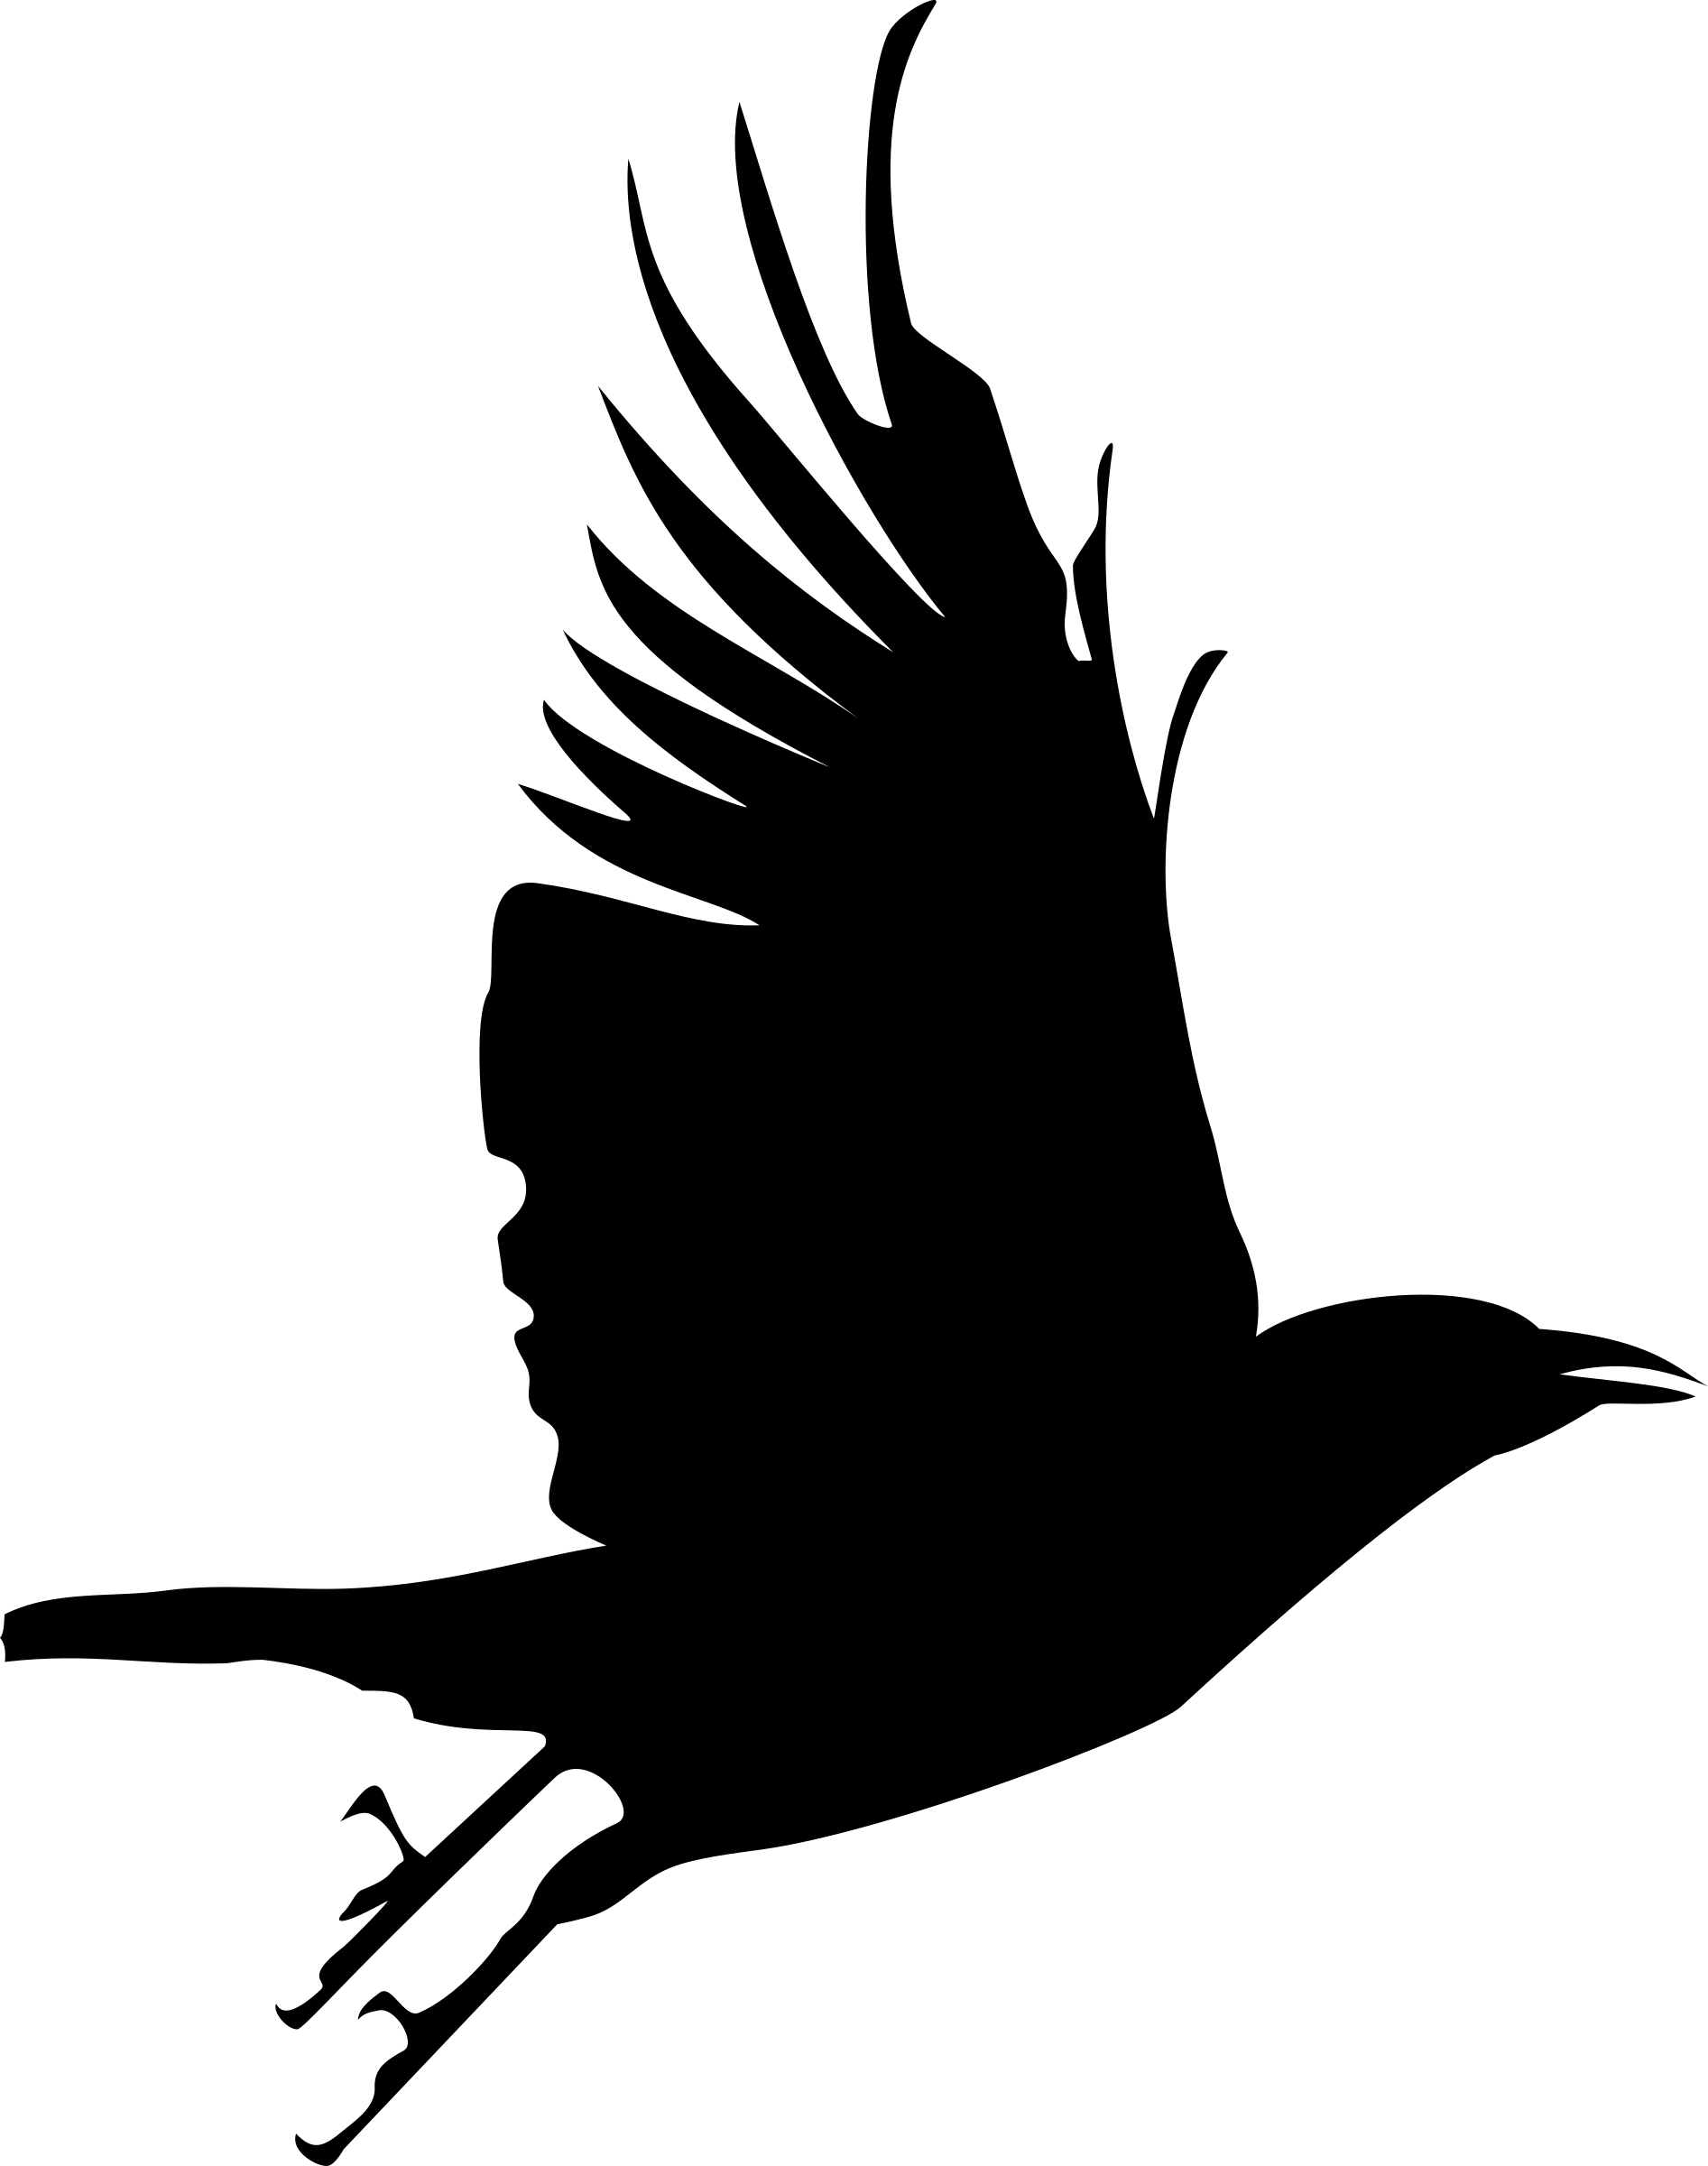 Submarine Silhouette Clip Art